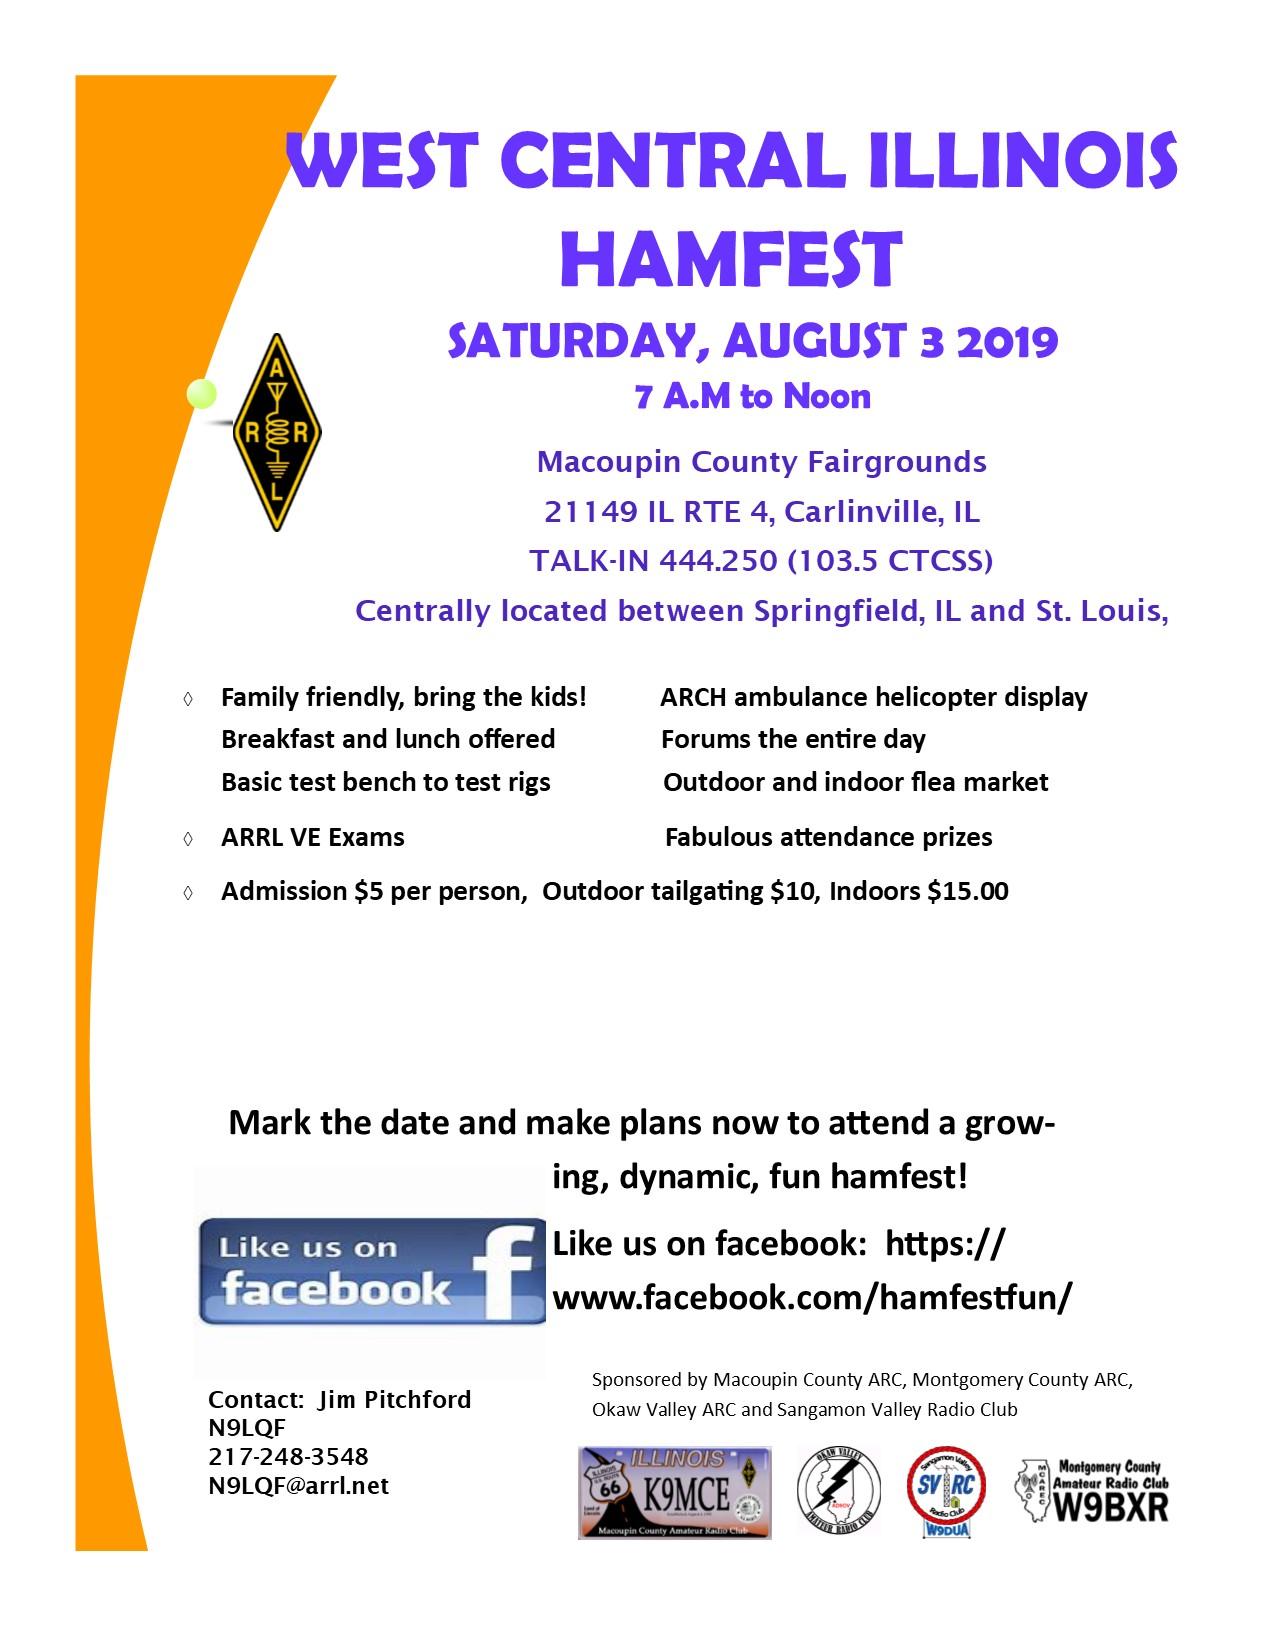 Hamfest | K9MCE Radio Club